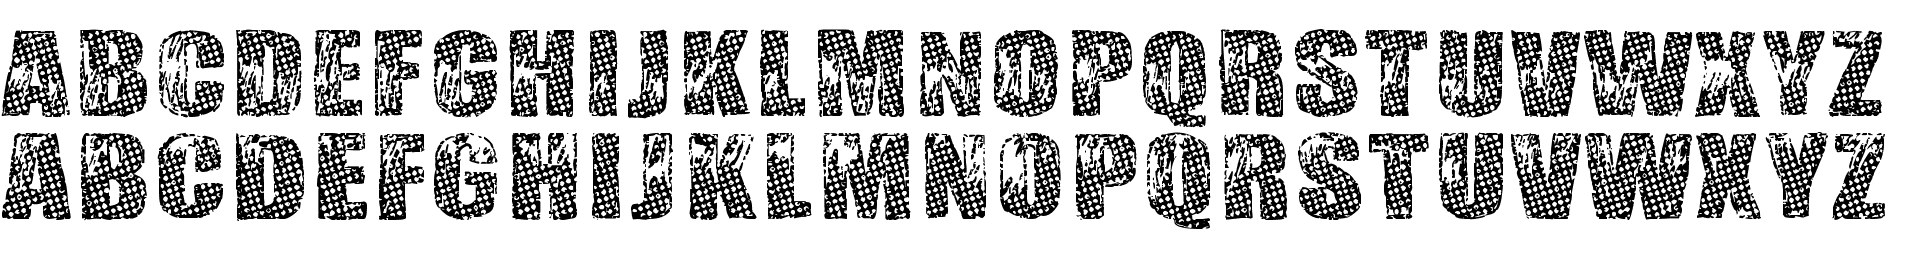 Gogol, Simone & Monroe